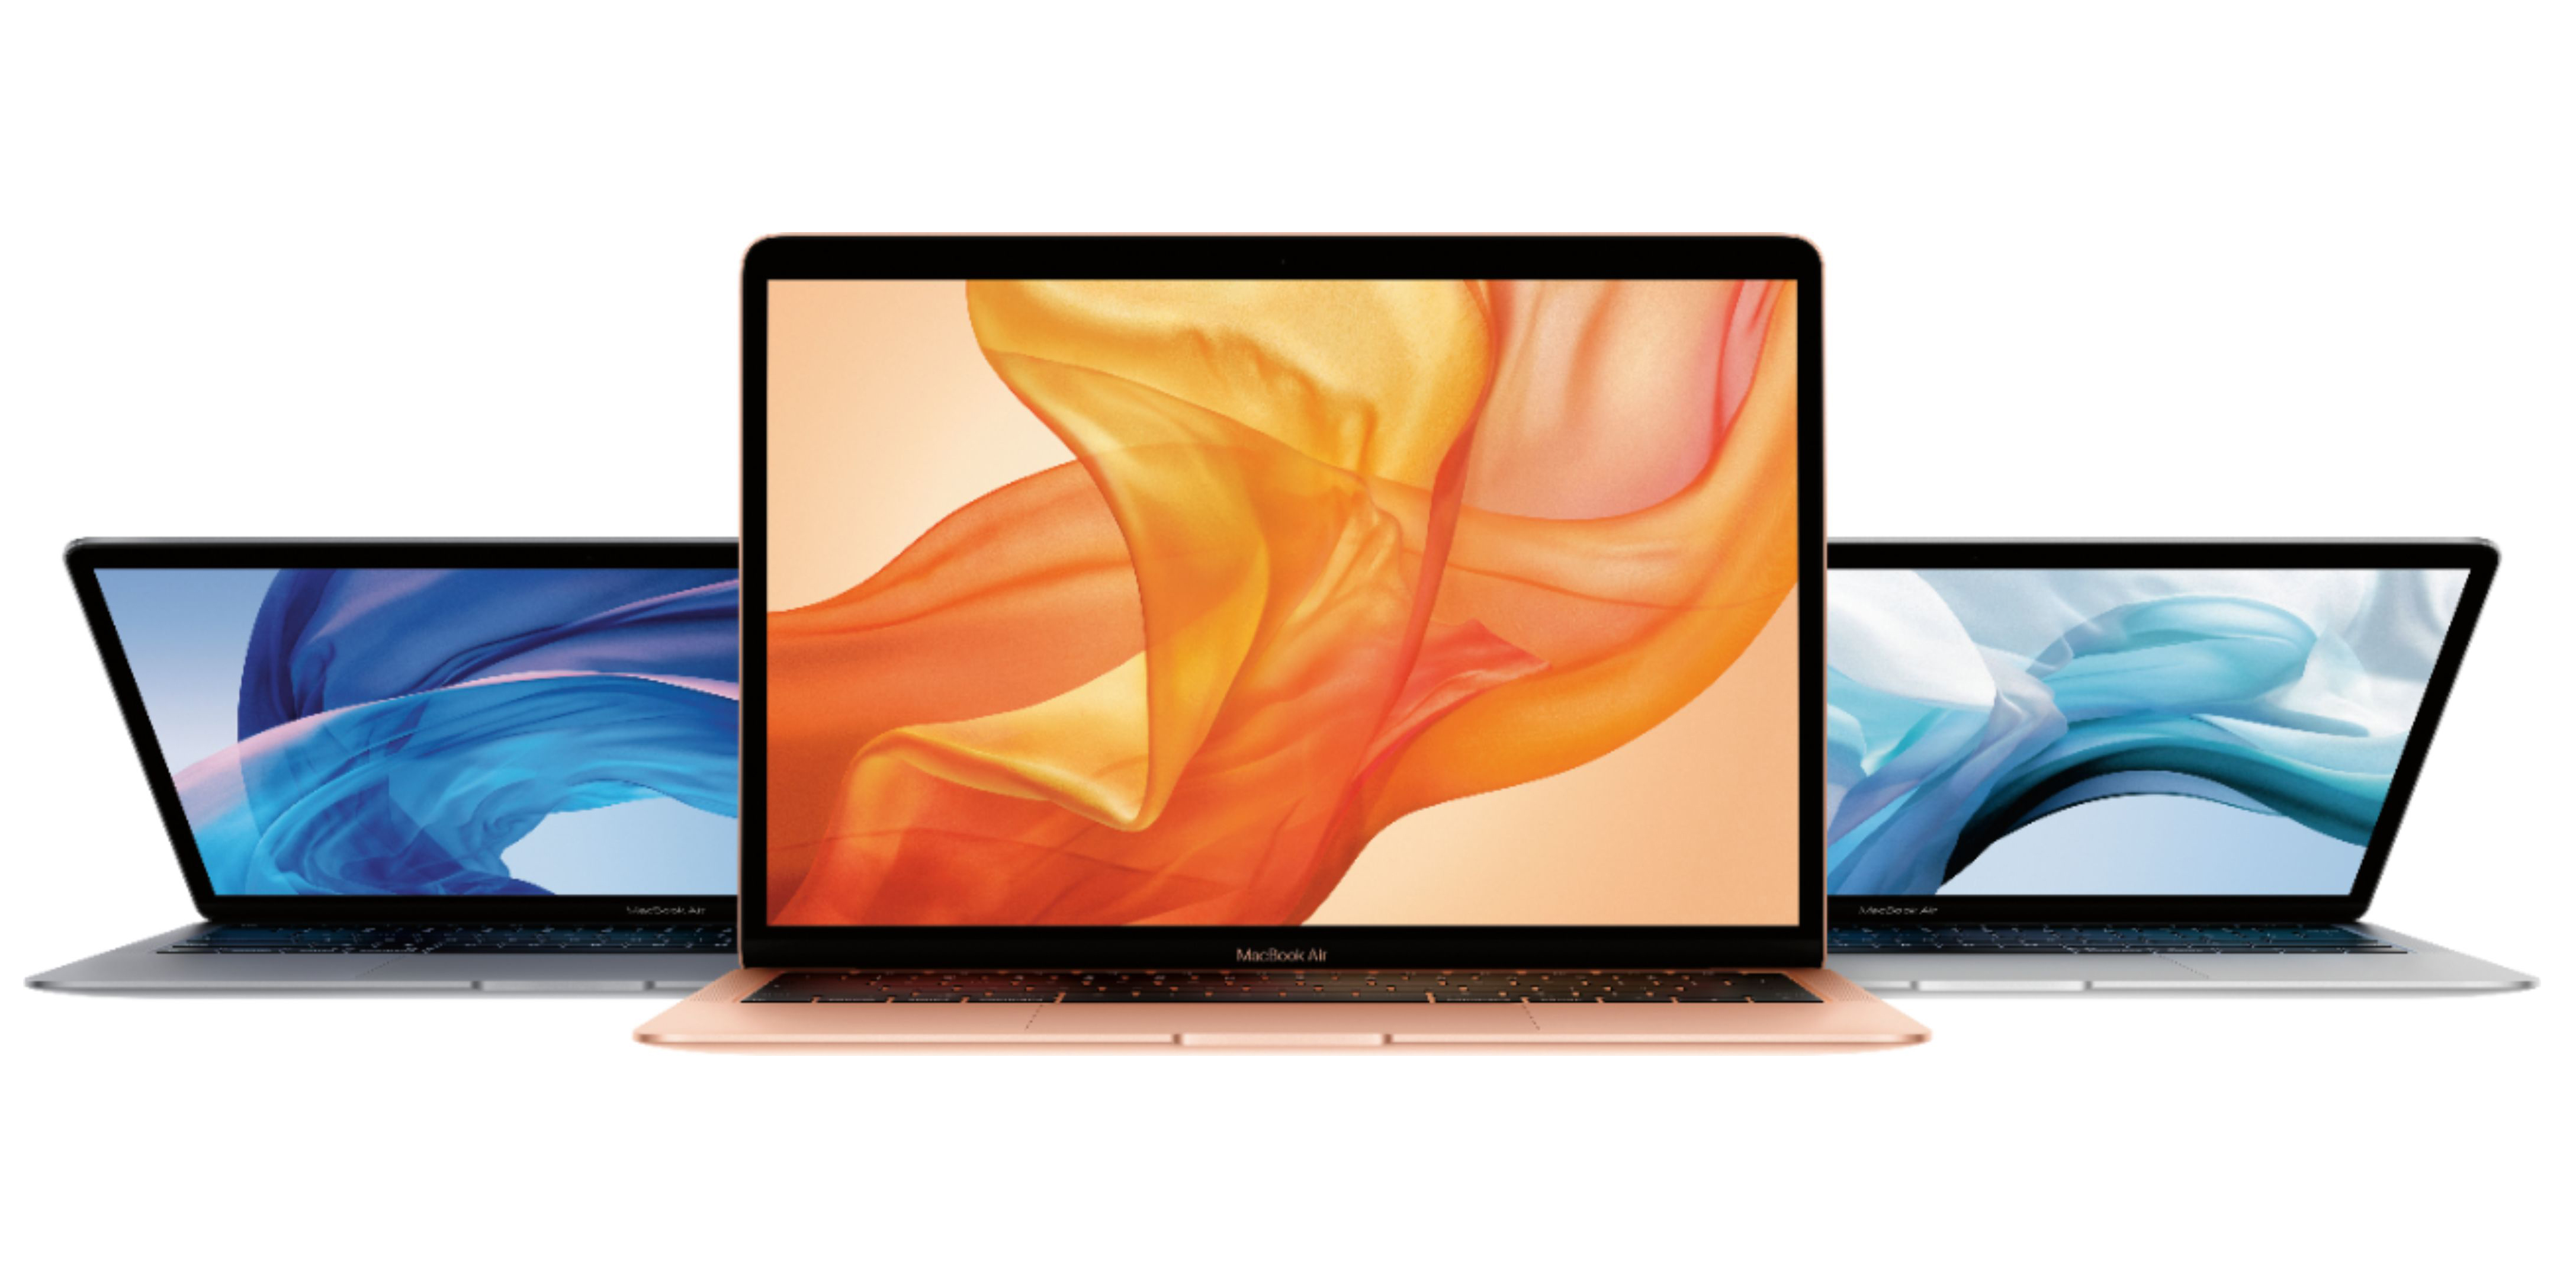 Apple's latest 13-inch MacBook Air returns to $999 (Reg. $1,199)